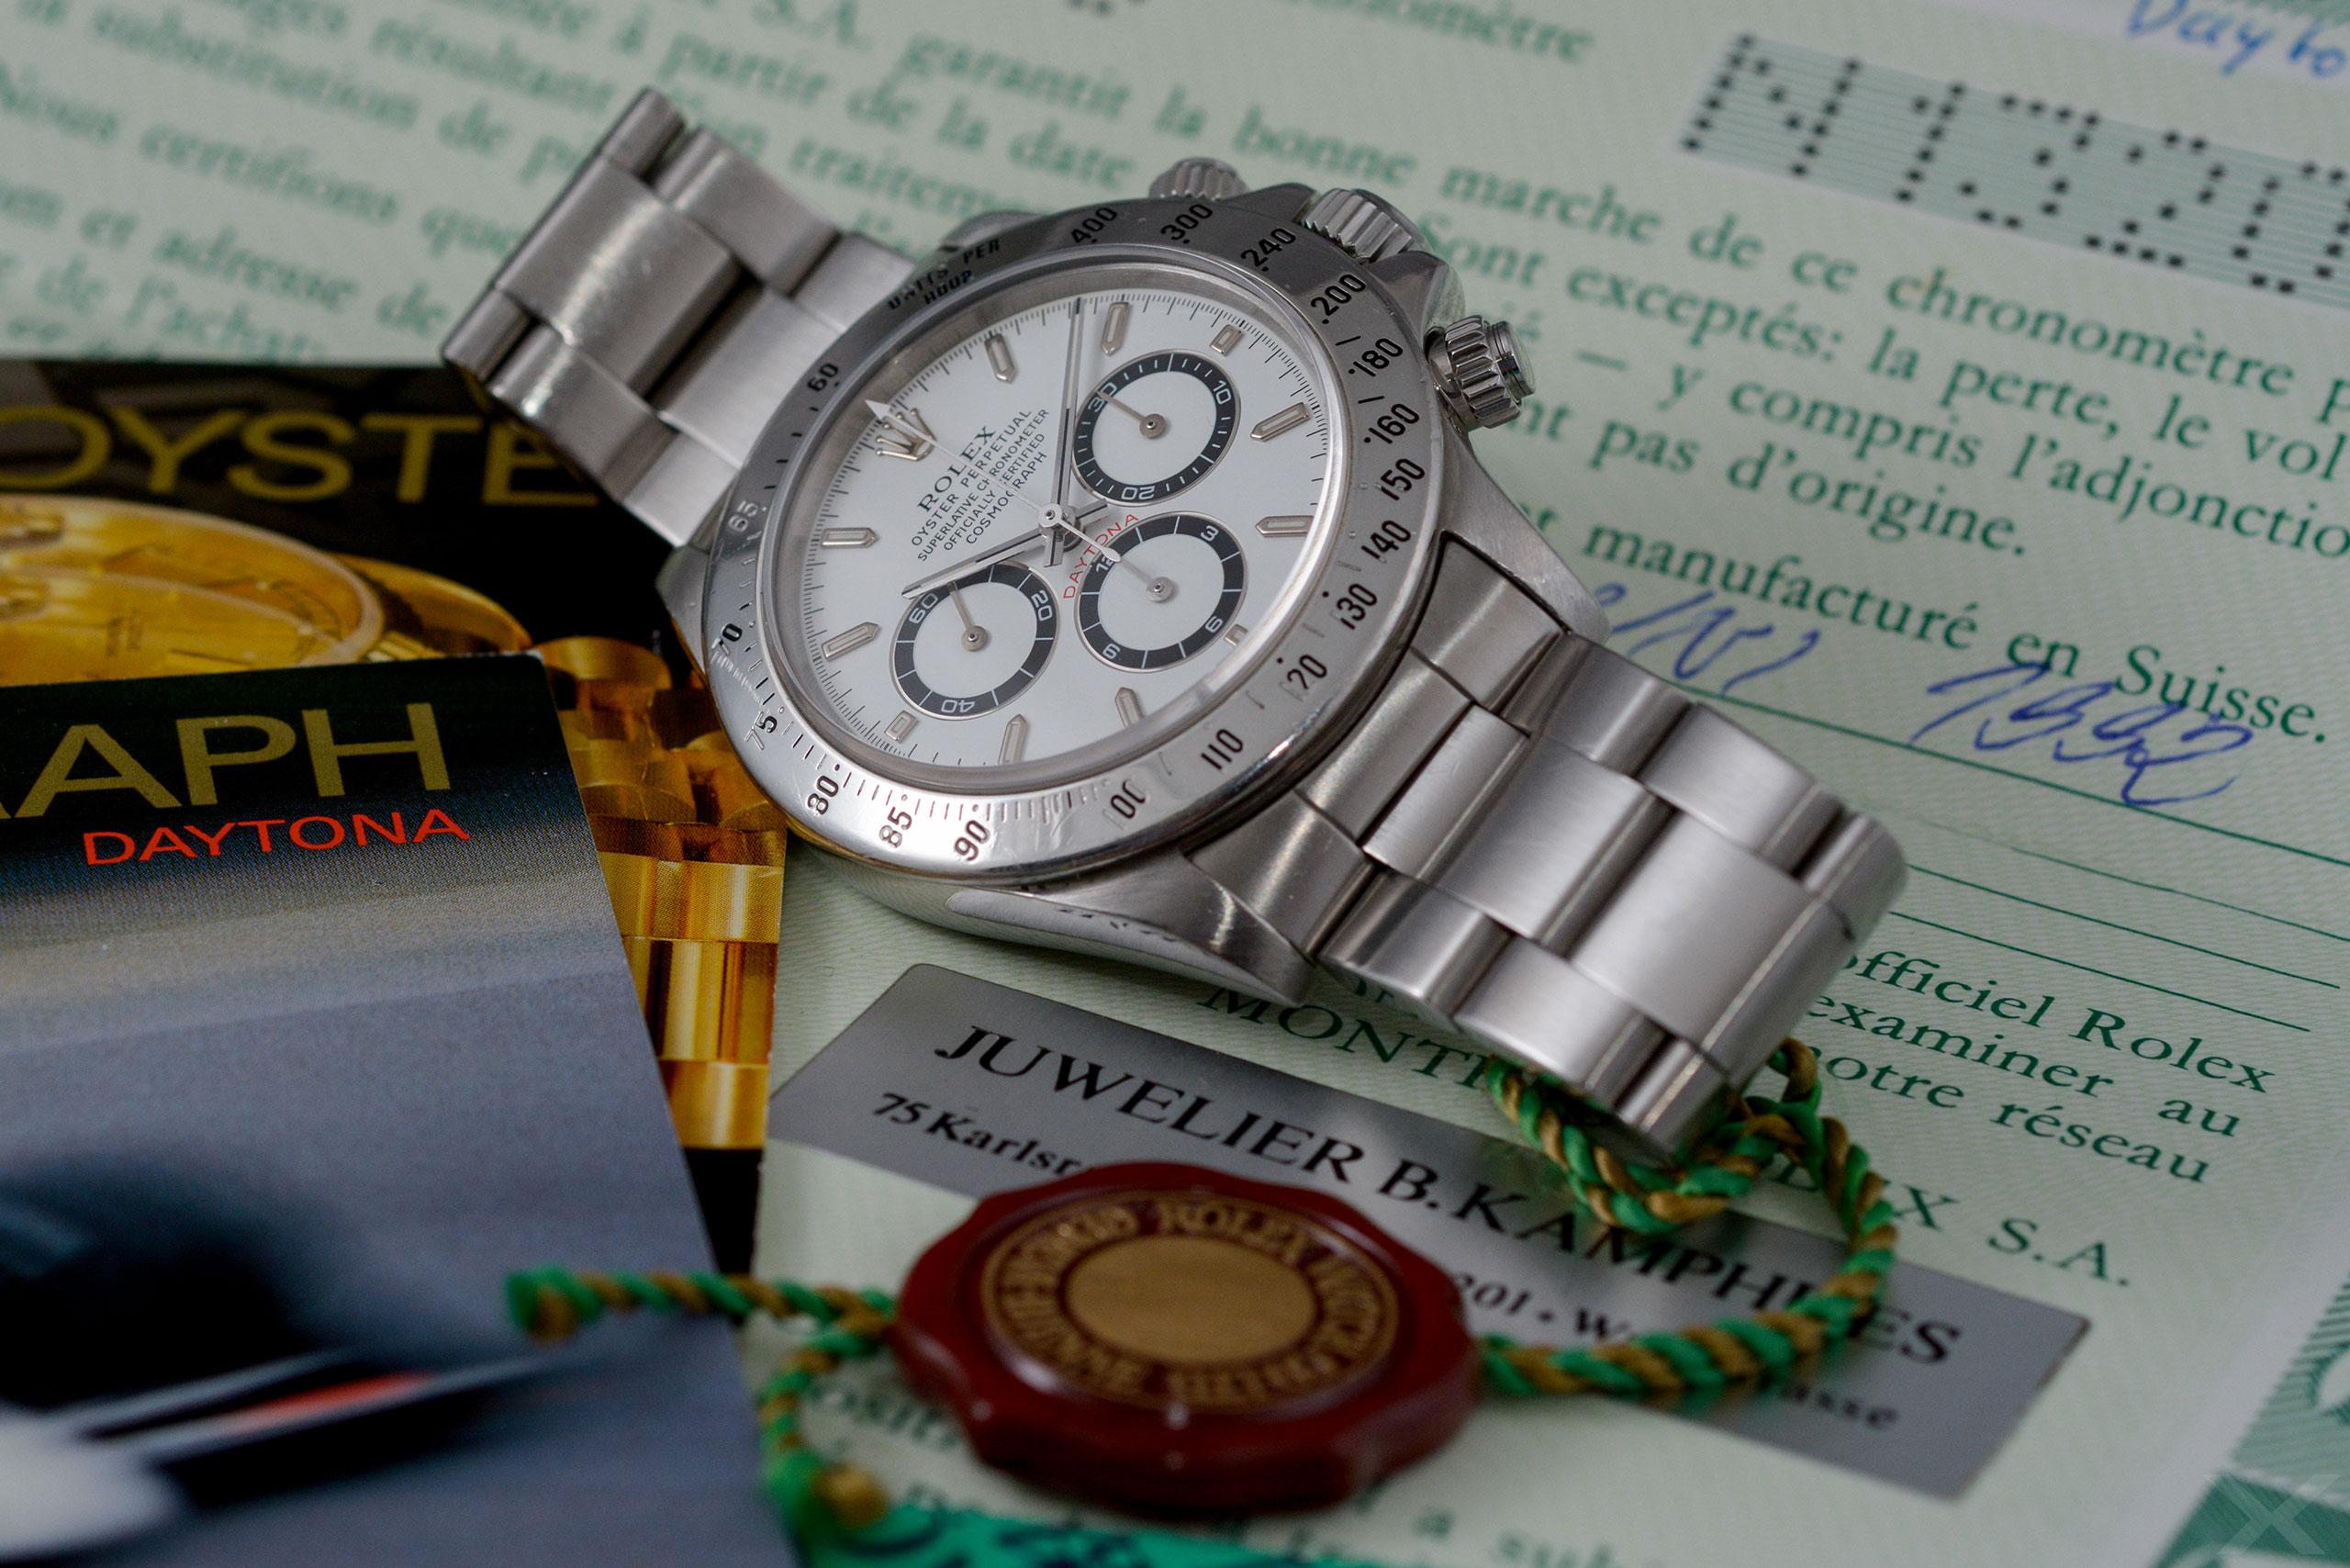 Rolex Daytona, Ref. 16520 Dr. Crott Luxify